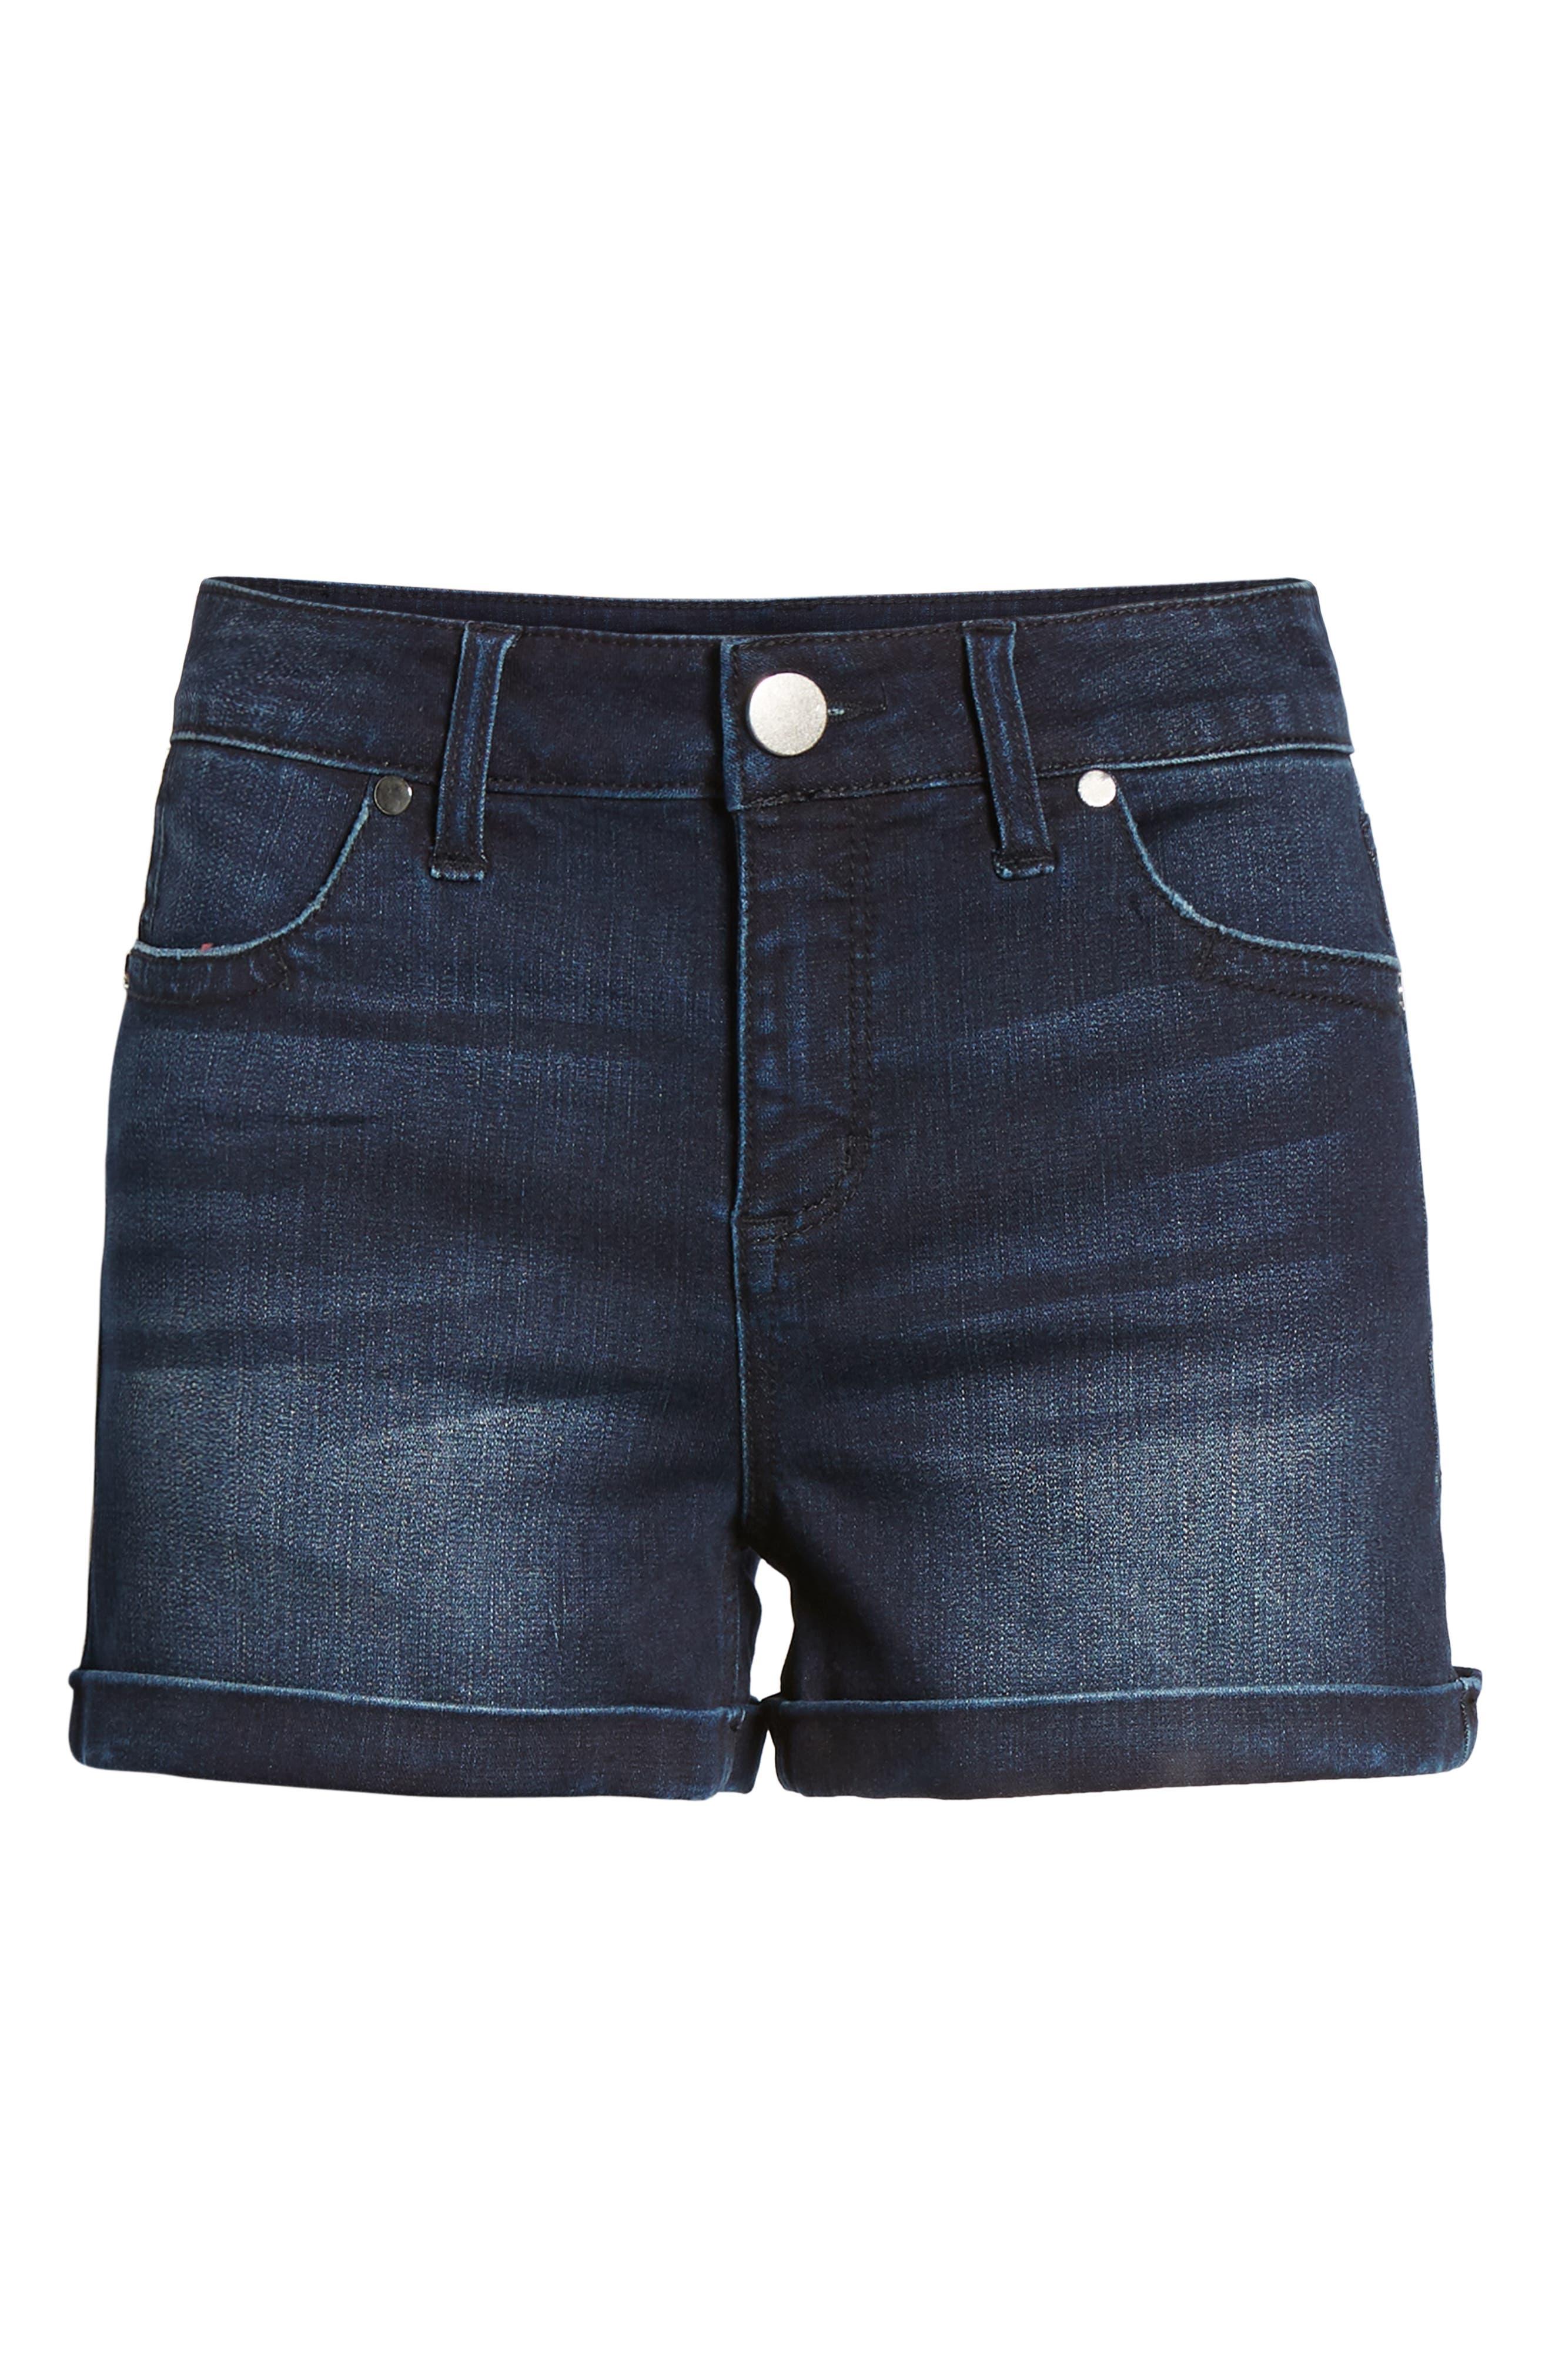 Cuffed Denim Shorts,                             Alternate thumbnail 7, color,                             Dark Wash